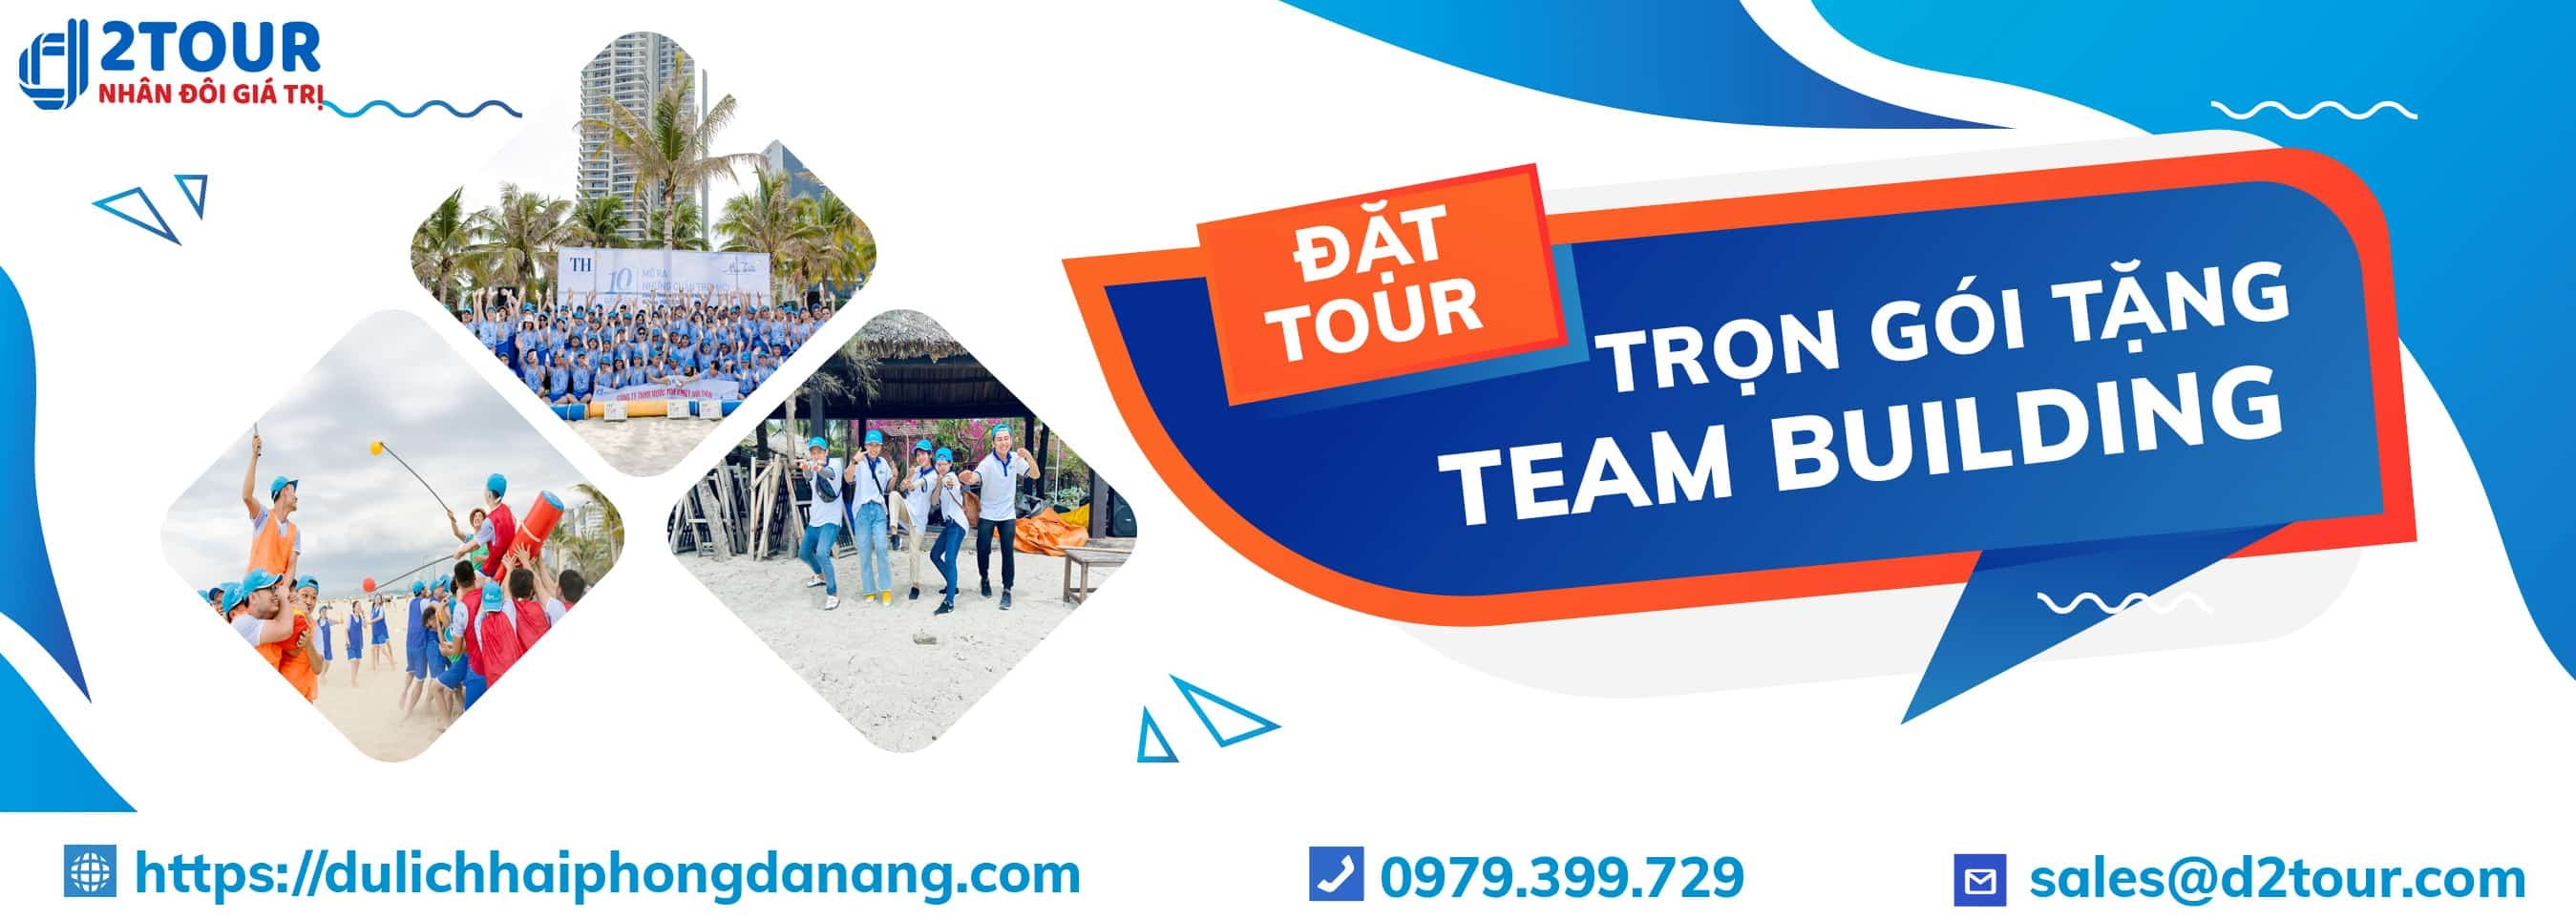 Khuyen mai du lich Hai Phong Da Nang